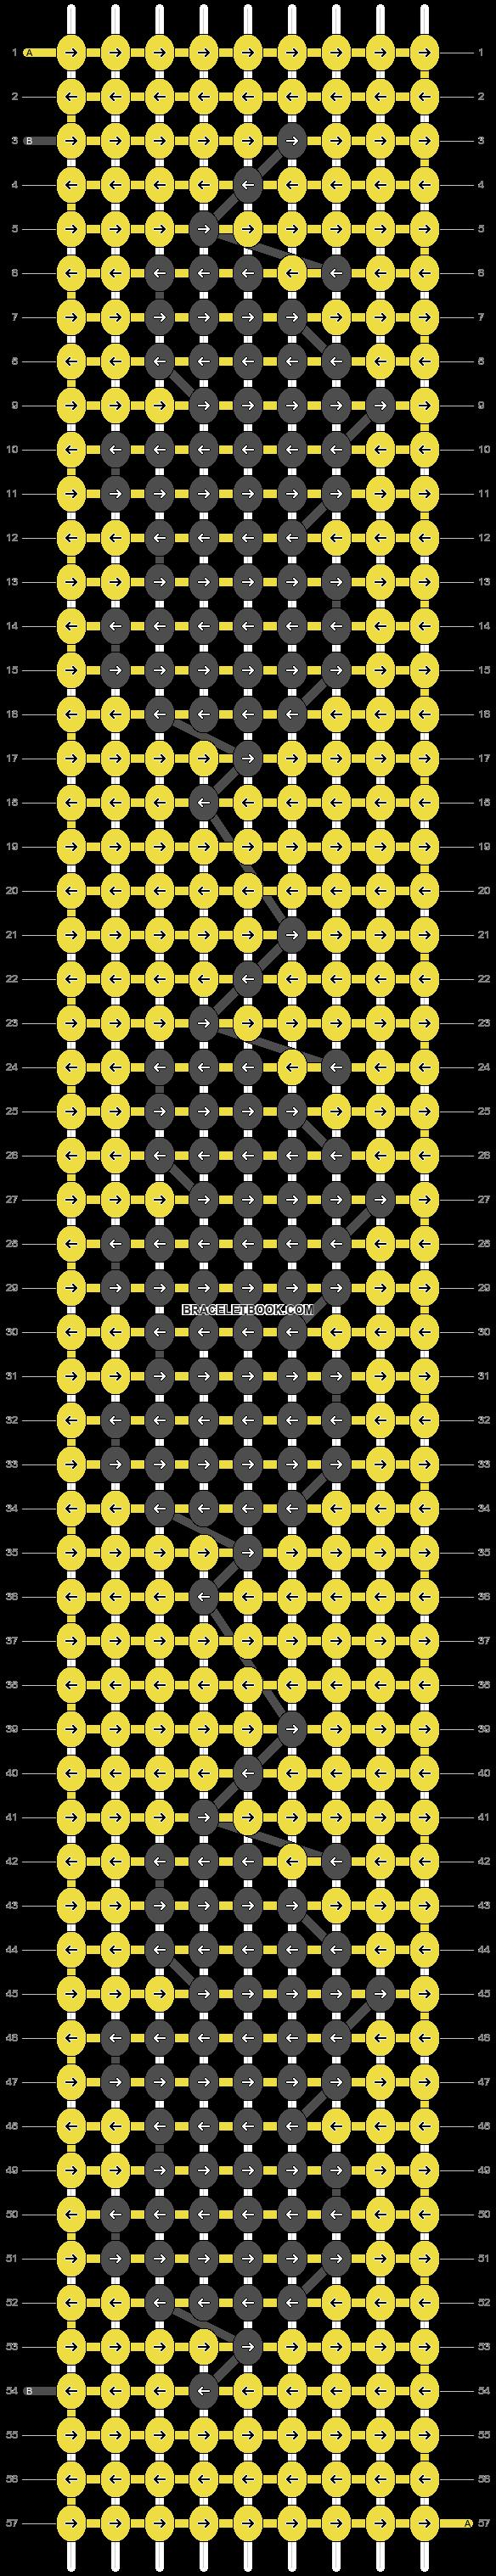 Alpha pattern #26831 pattern